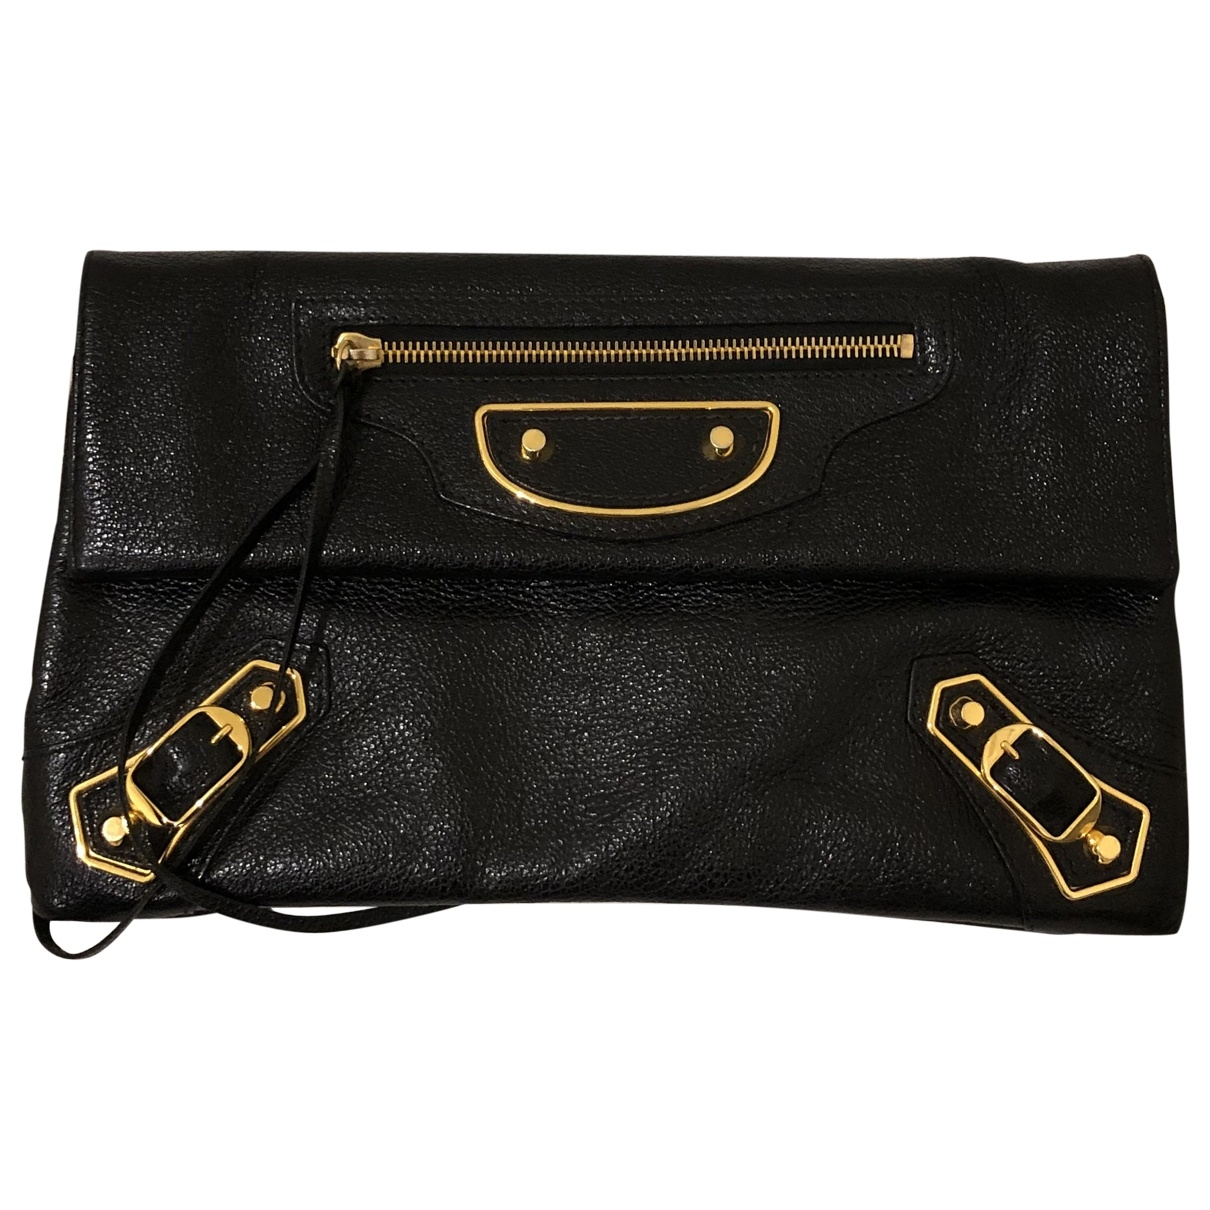 Balenciaga Envelop Black Leather Clutch bag for Women \N